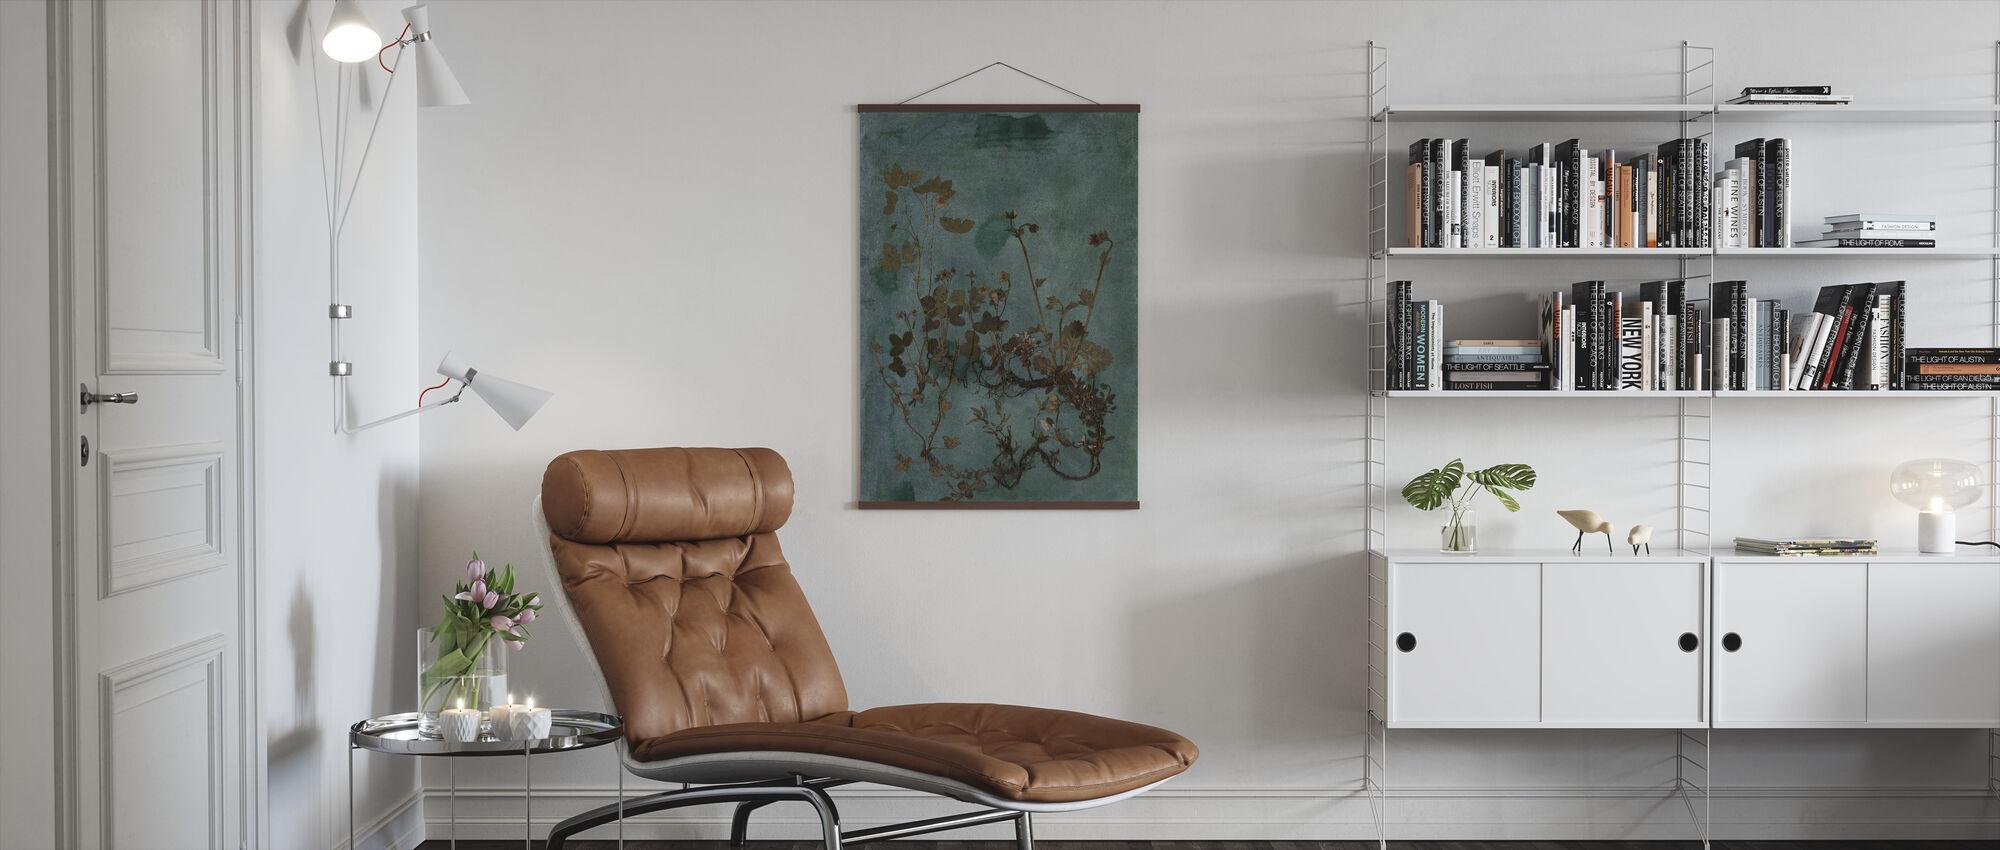 Rhizome - Poster - Living Room